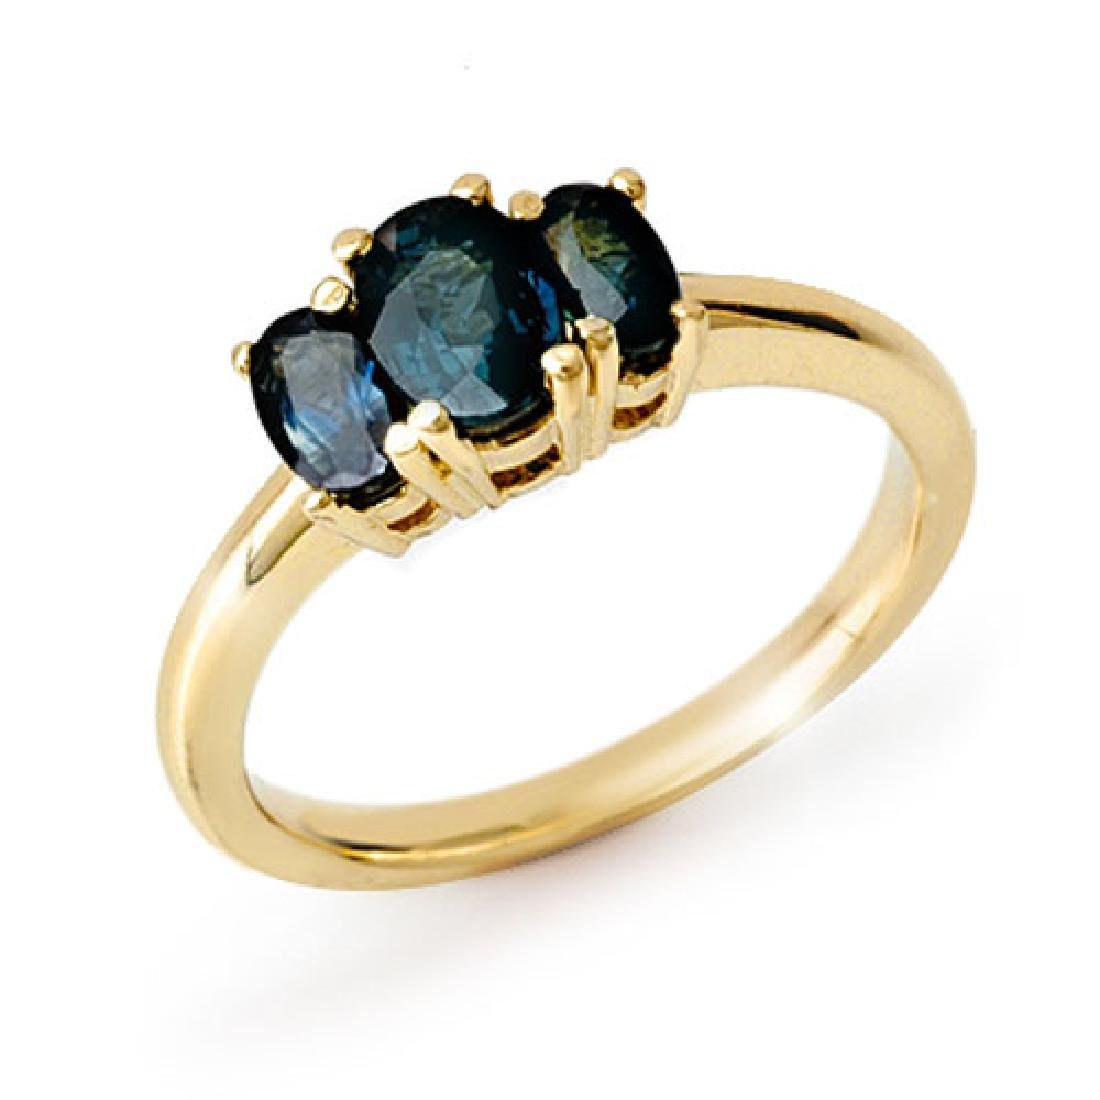 1.0 CTW Blue Sapphire Ring 10K Yellow Gold